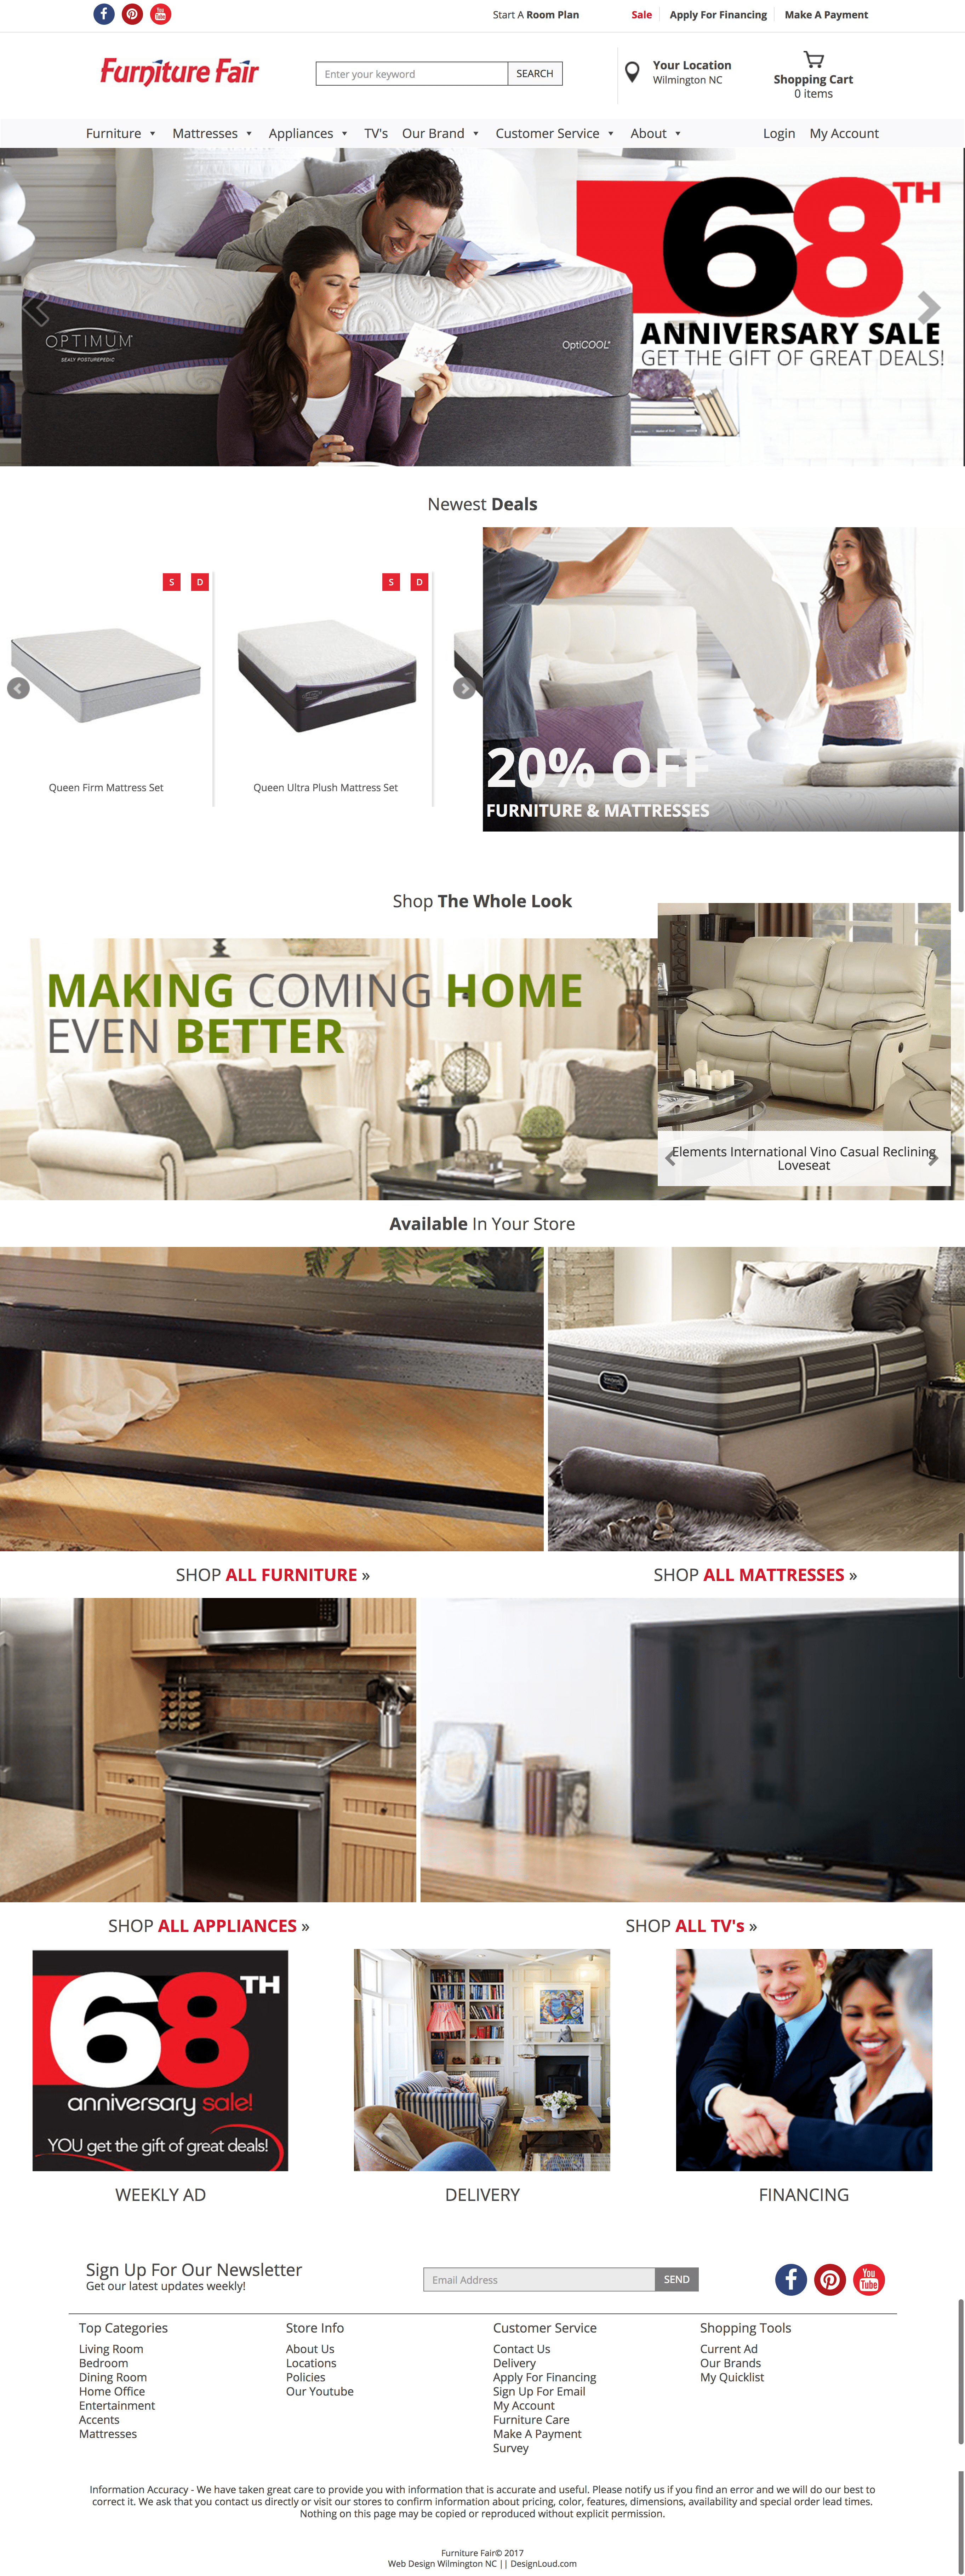 Web Design, Graphic Design, Digital Marketing | Wilmington NC